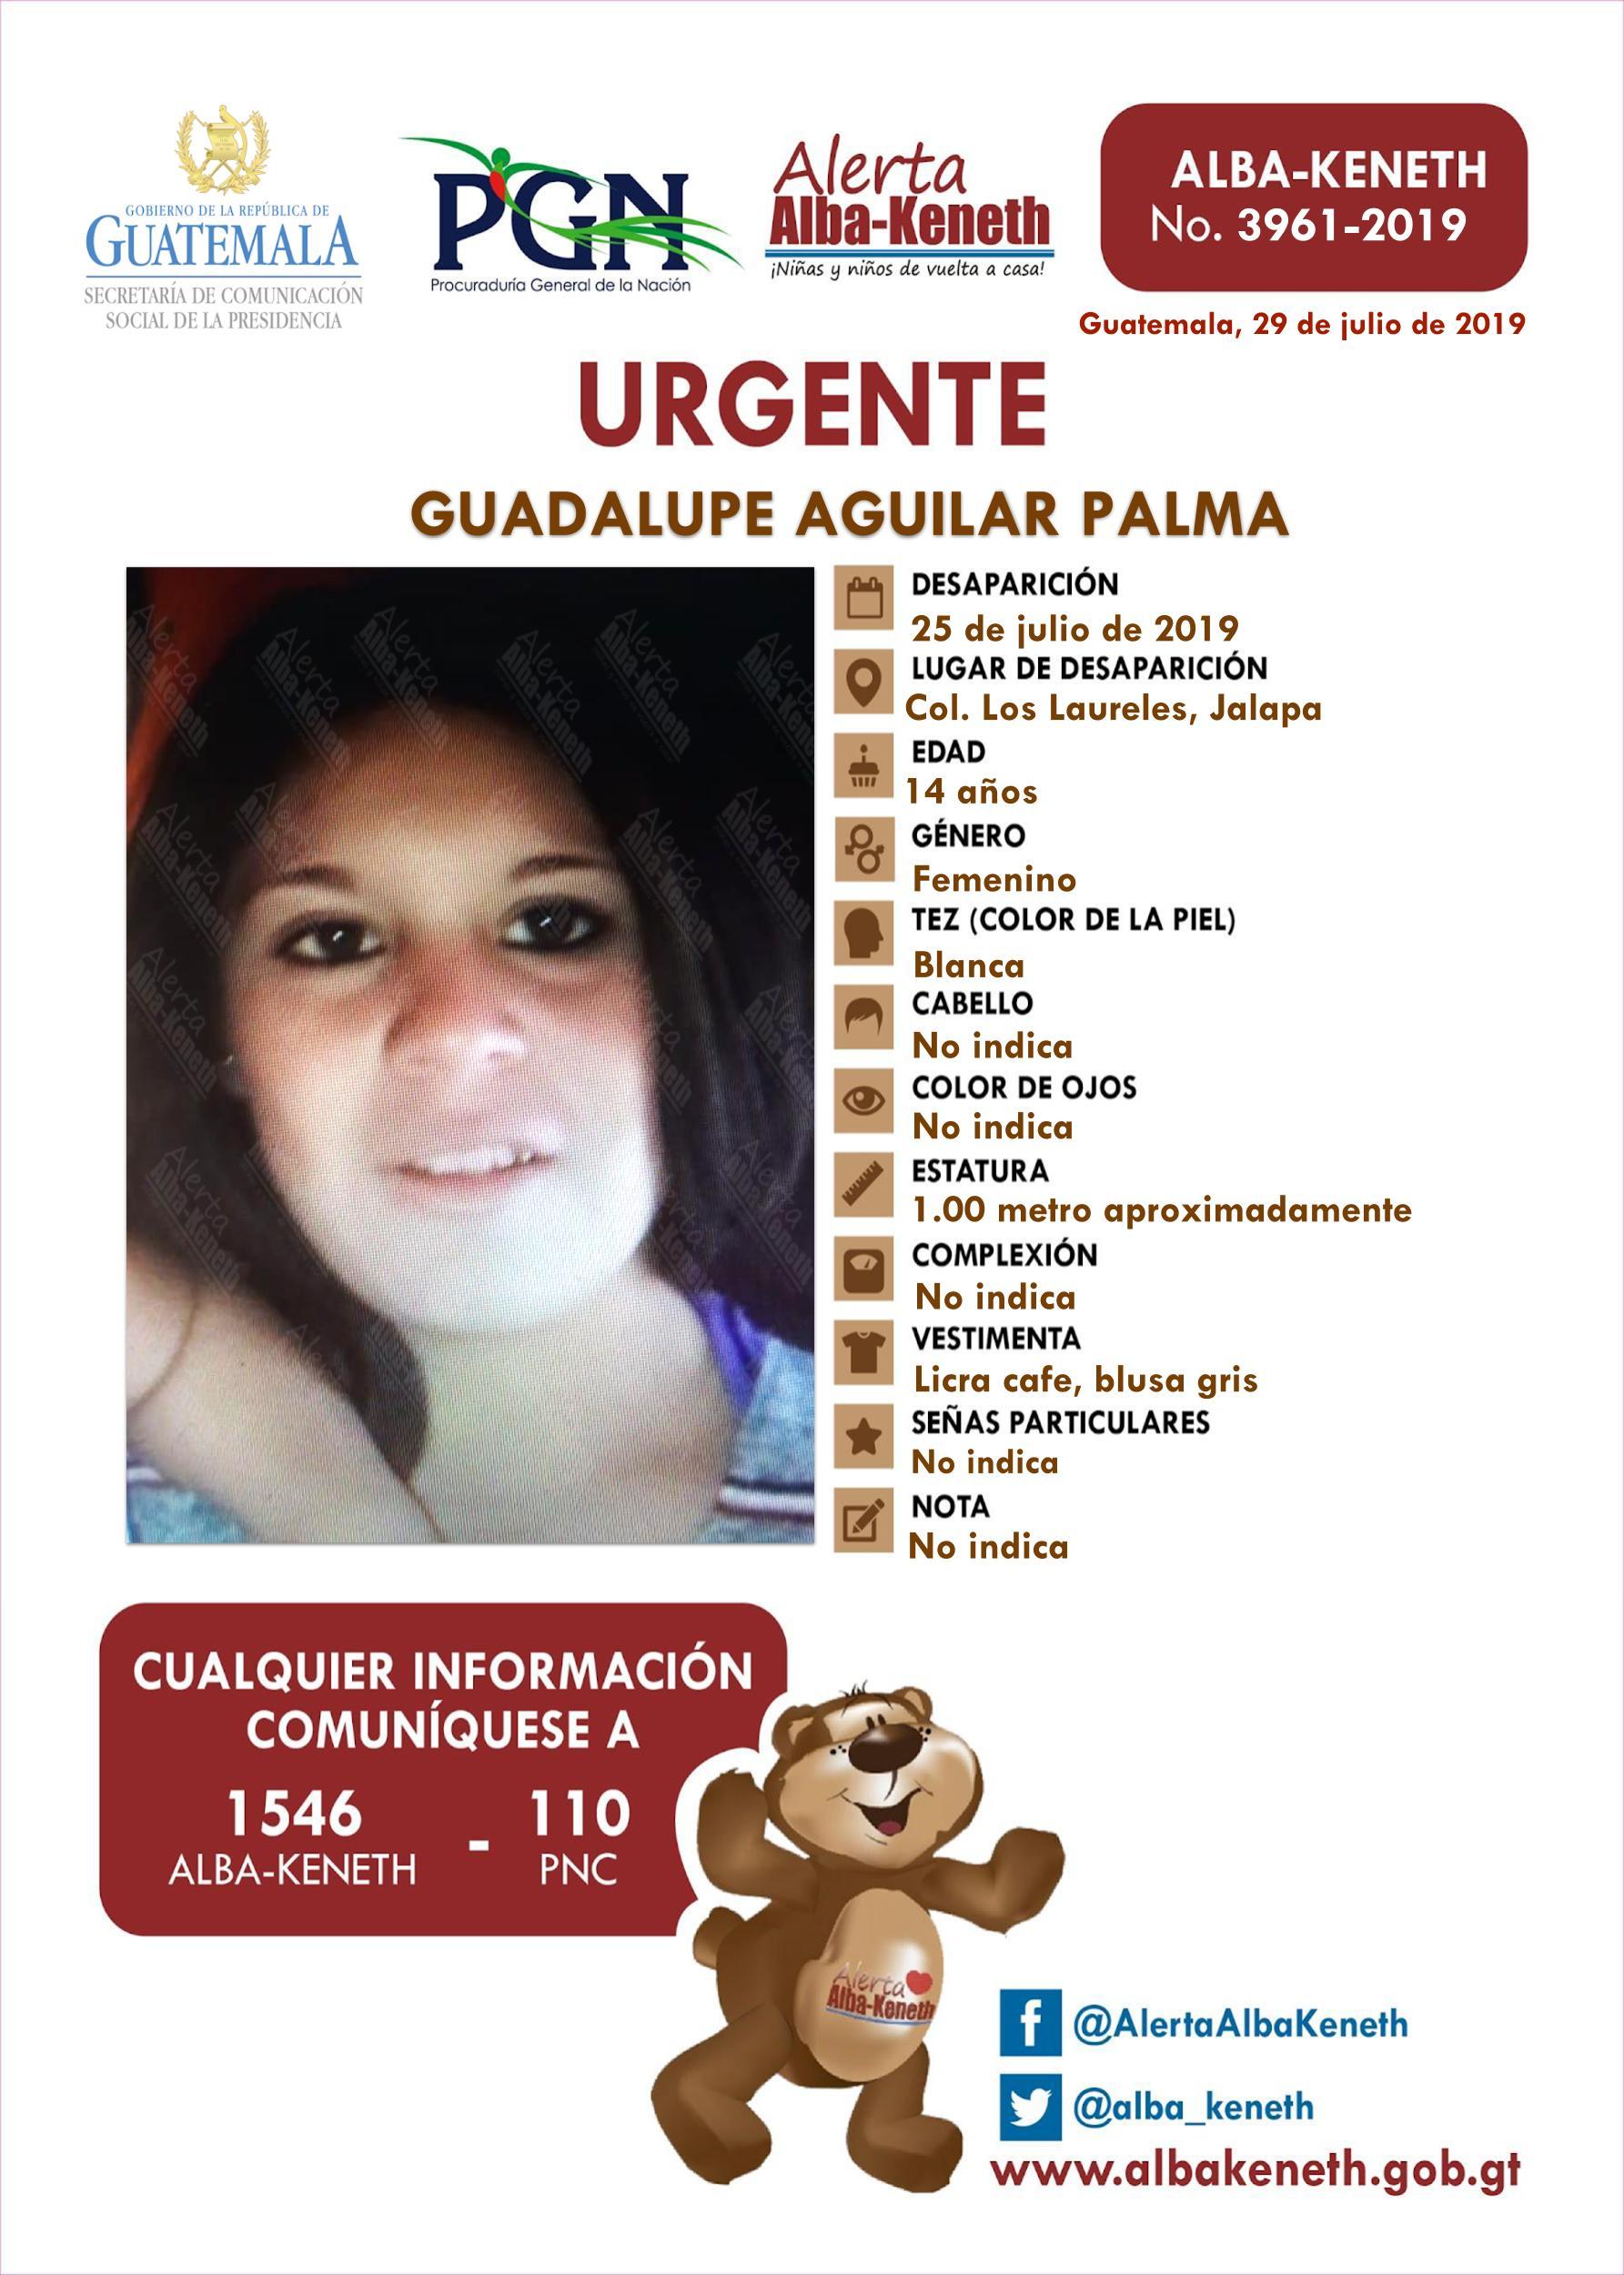 Guadalupe Aguilar Palma